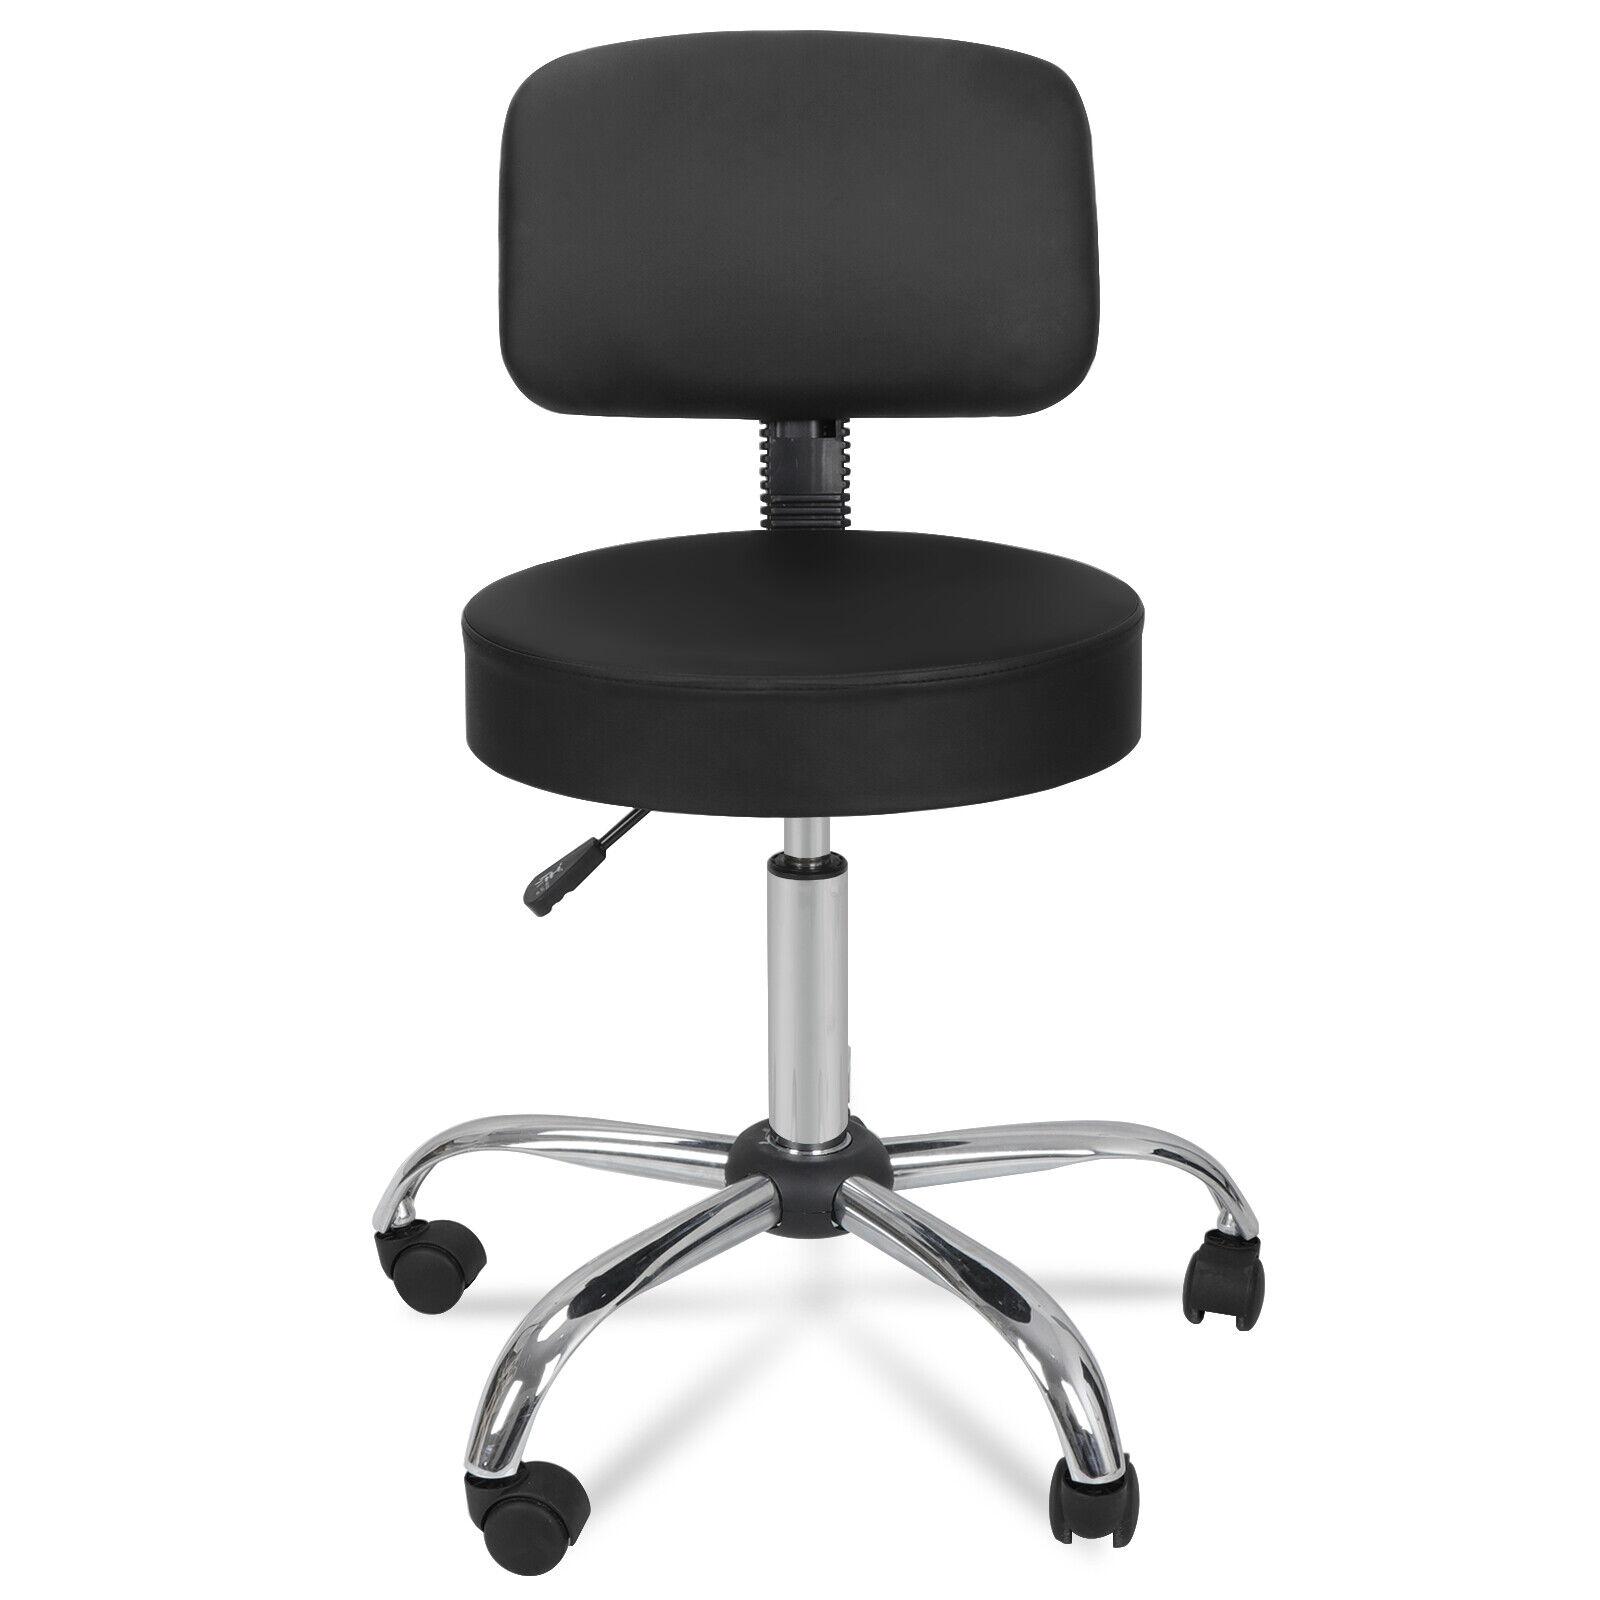 Adjustable Hydraulic Rolling Swivel Massage Spa Salon Stool Chair w/Back Rest Health & Beauty